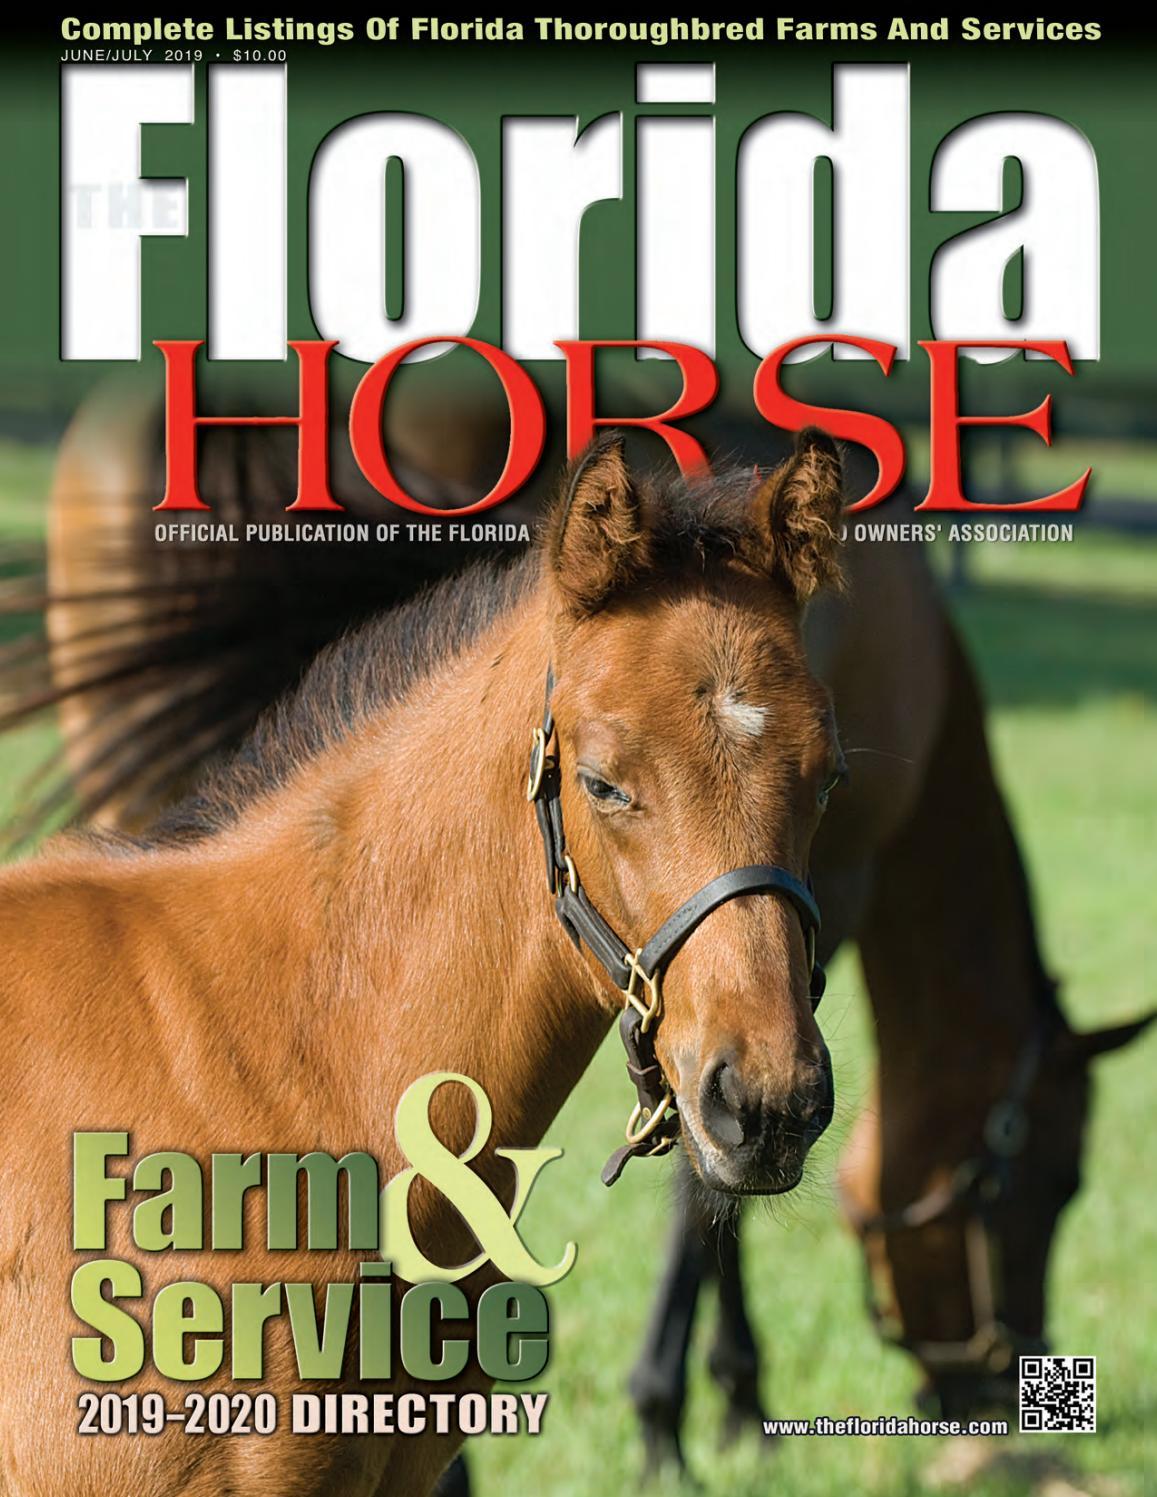 Florida Horse 2019 Farm & Service Directory by Florida